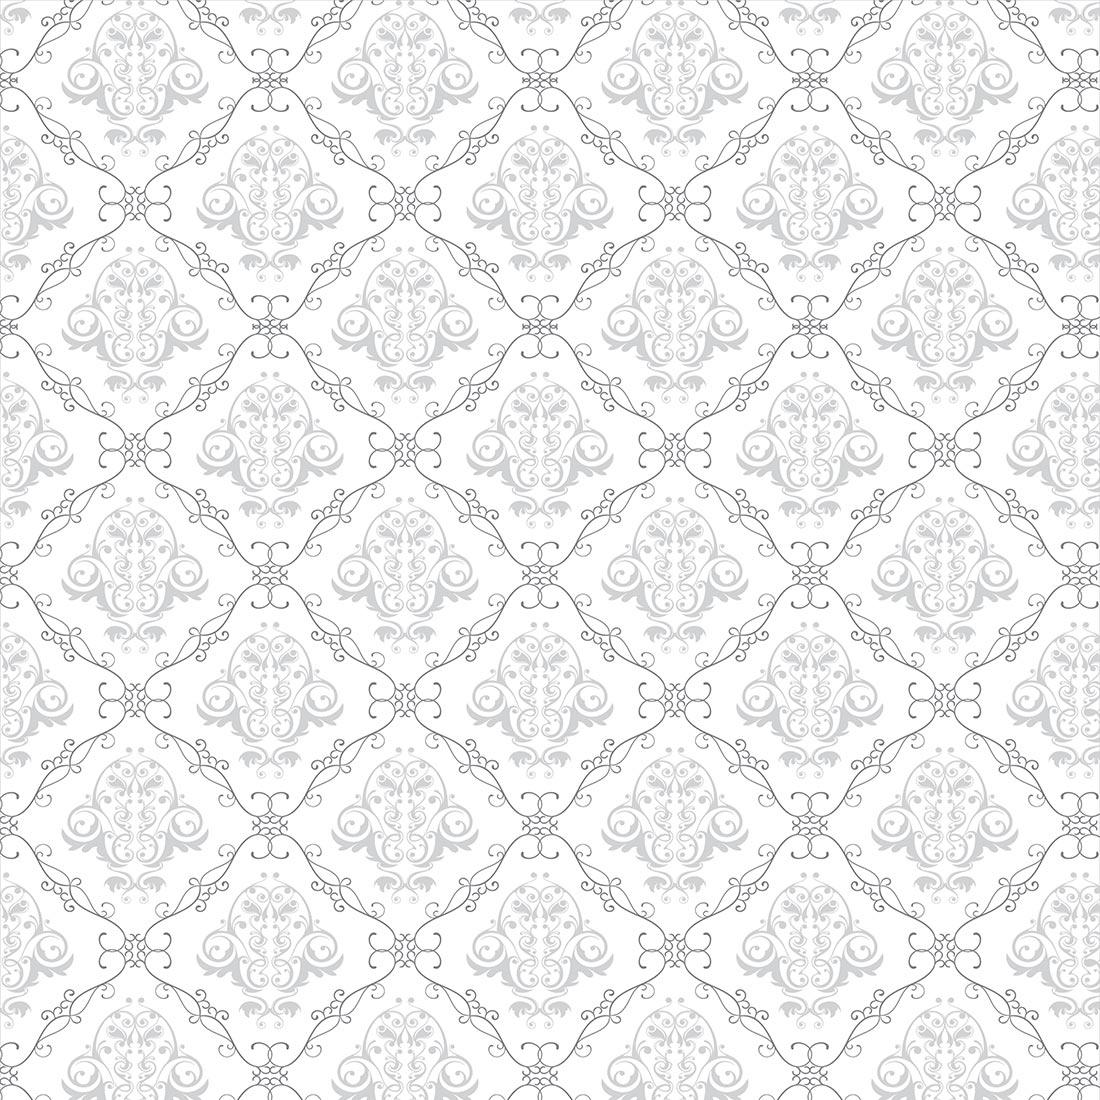 Papel de Parede Arabesco Jacquard Cinza Fino, Contornos Preto sobre Branco